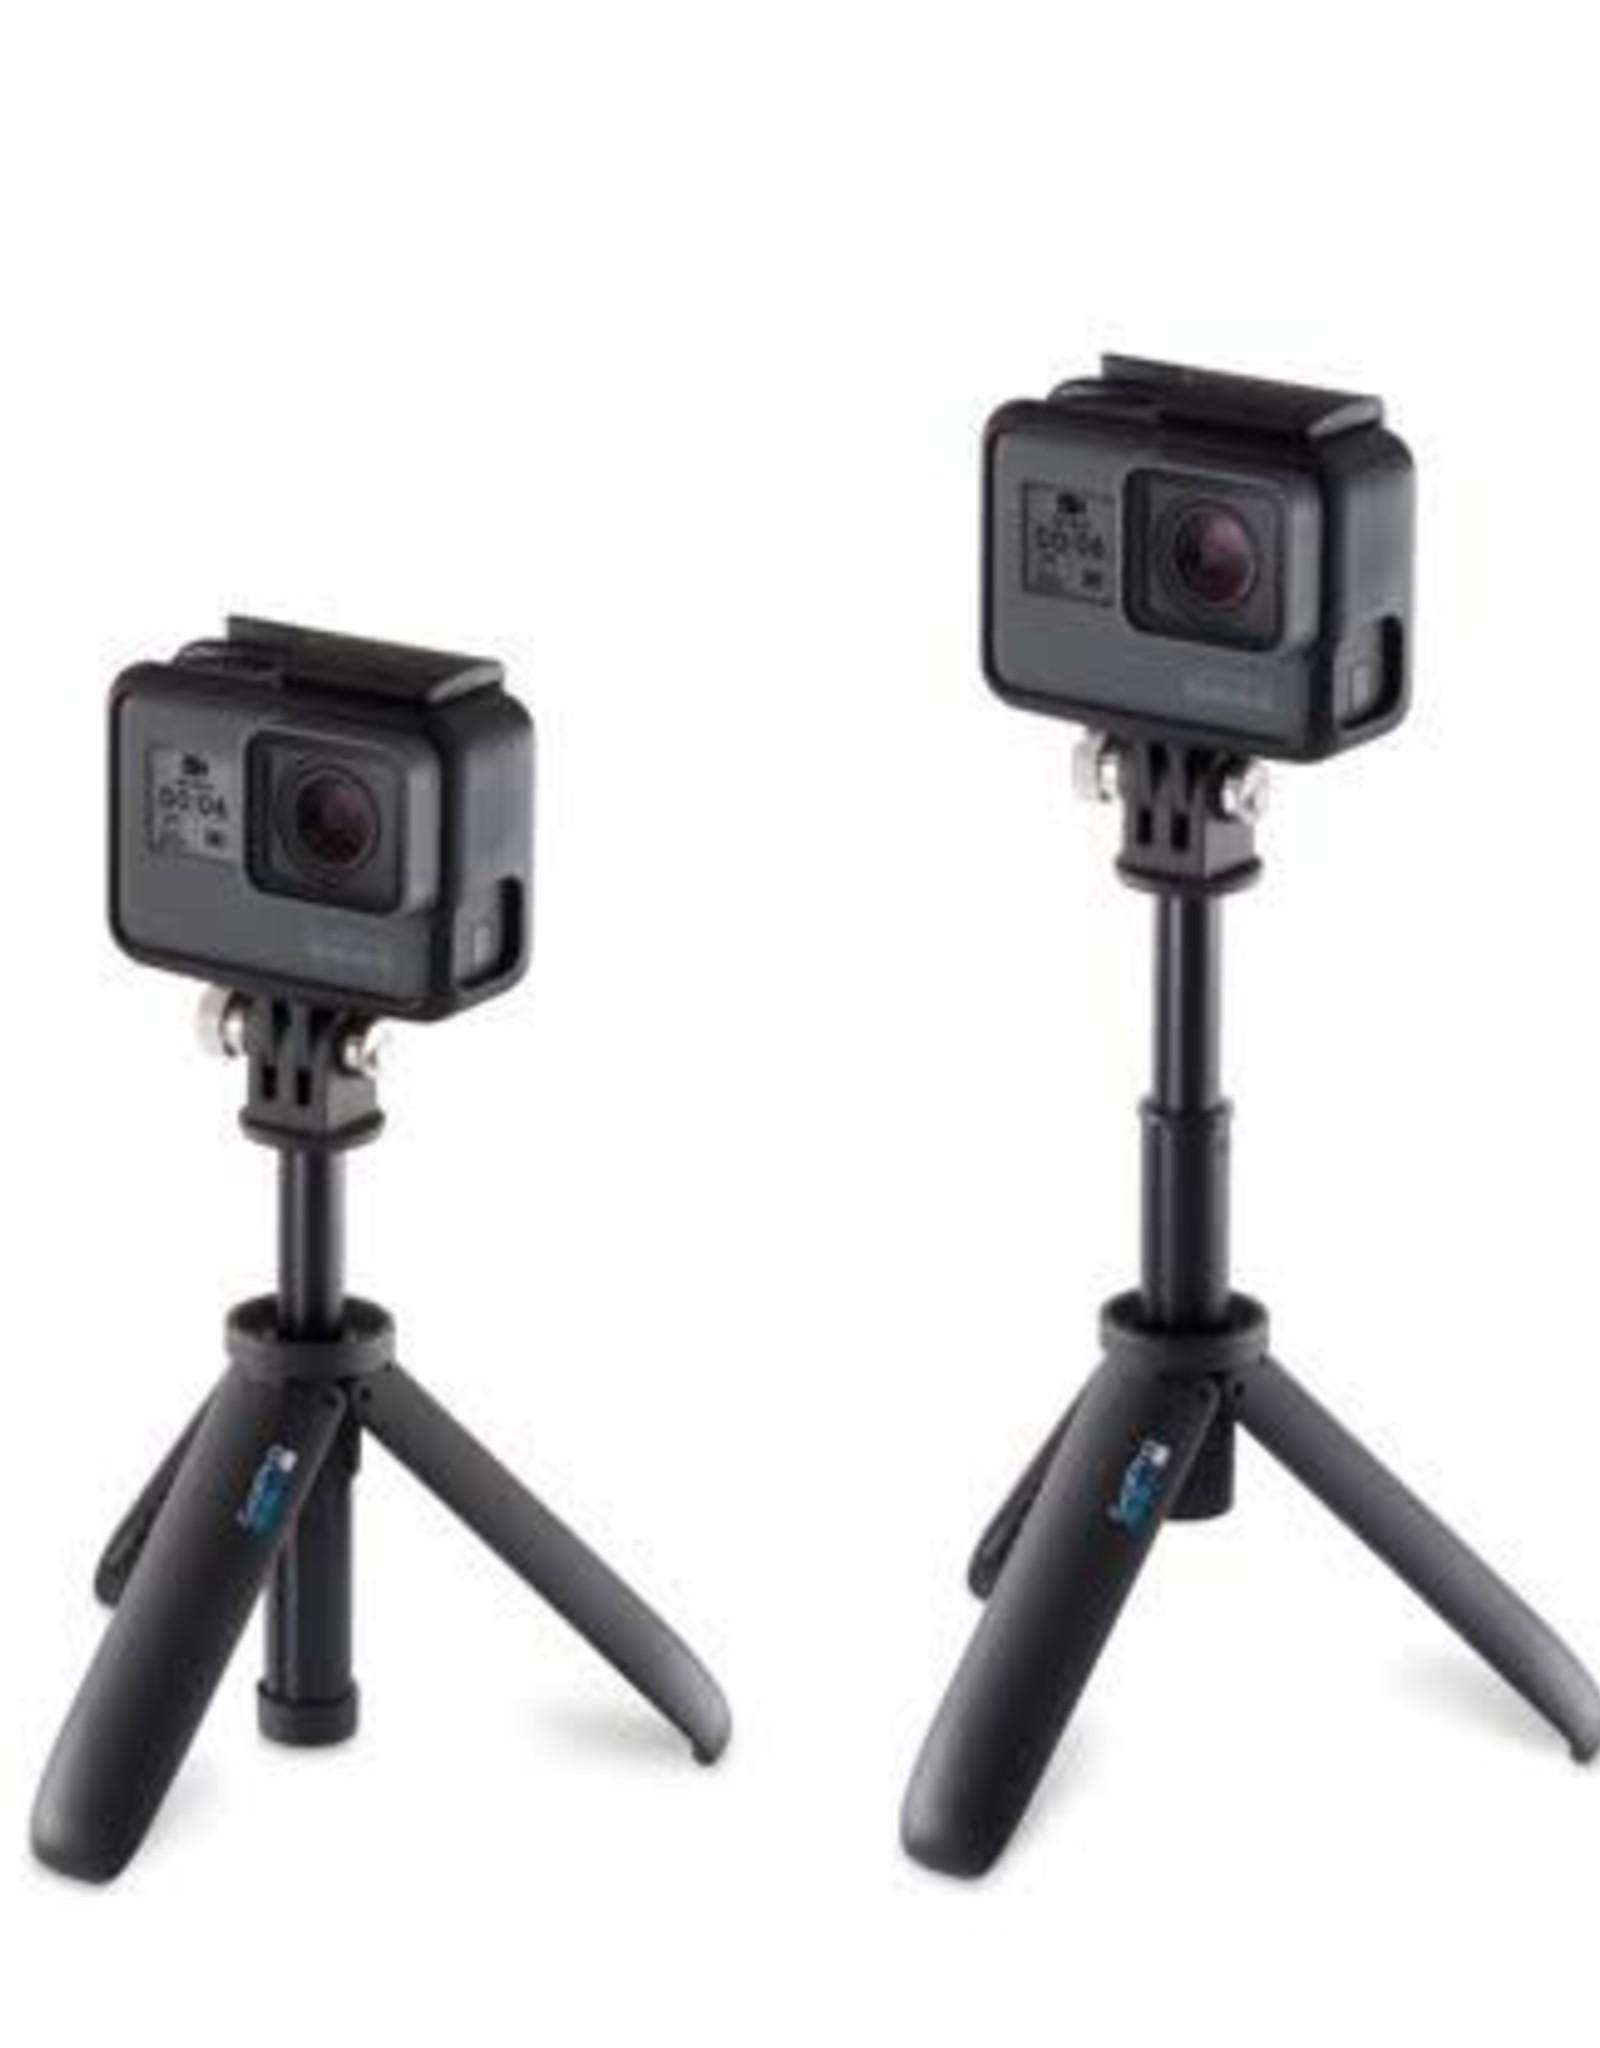 GoPro GoPro   Shorty (Mini Extension Pole + Tripod)   GP-AFTTM-001